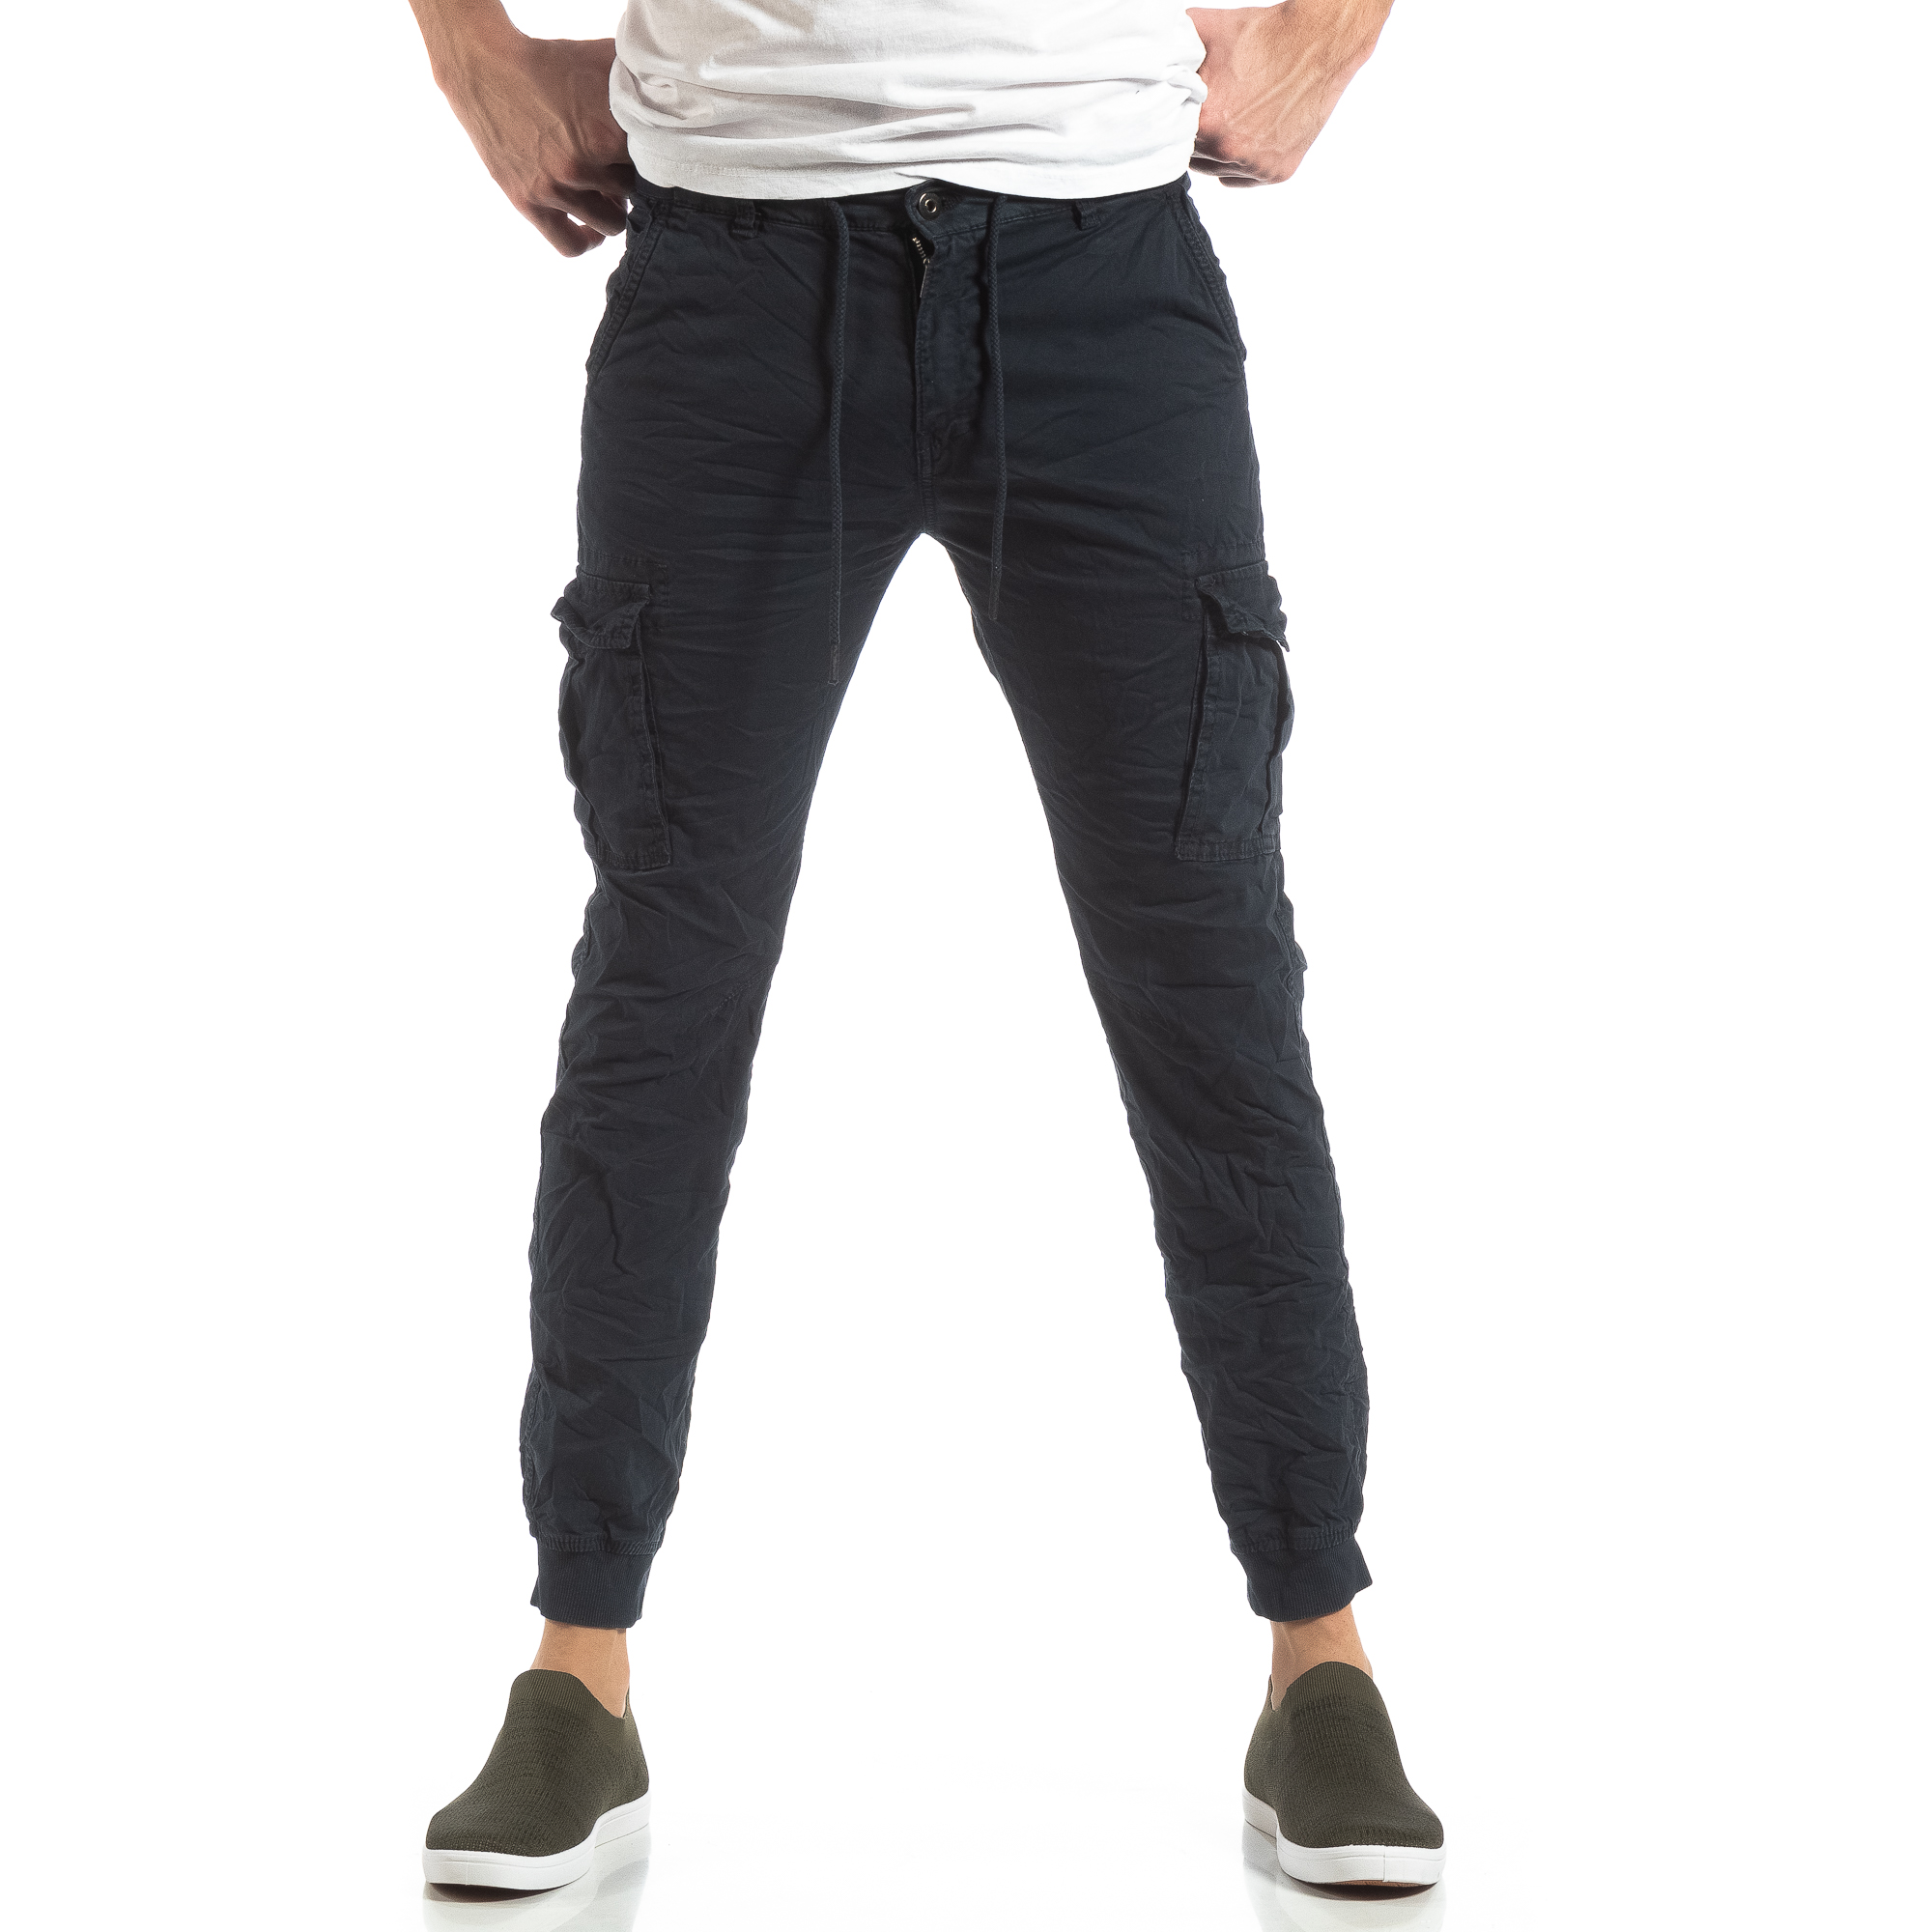 bbacc5d4b94 Ανδρικό σκούρο μπλε παντελόνι cargo με κορδόνια